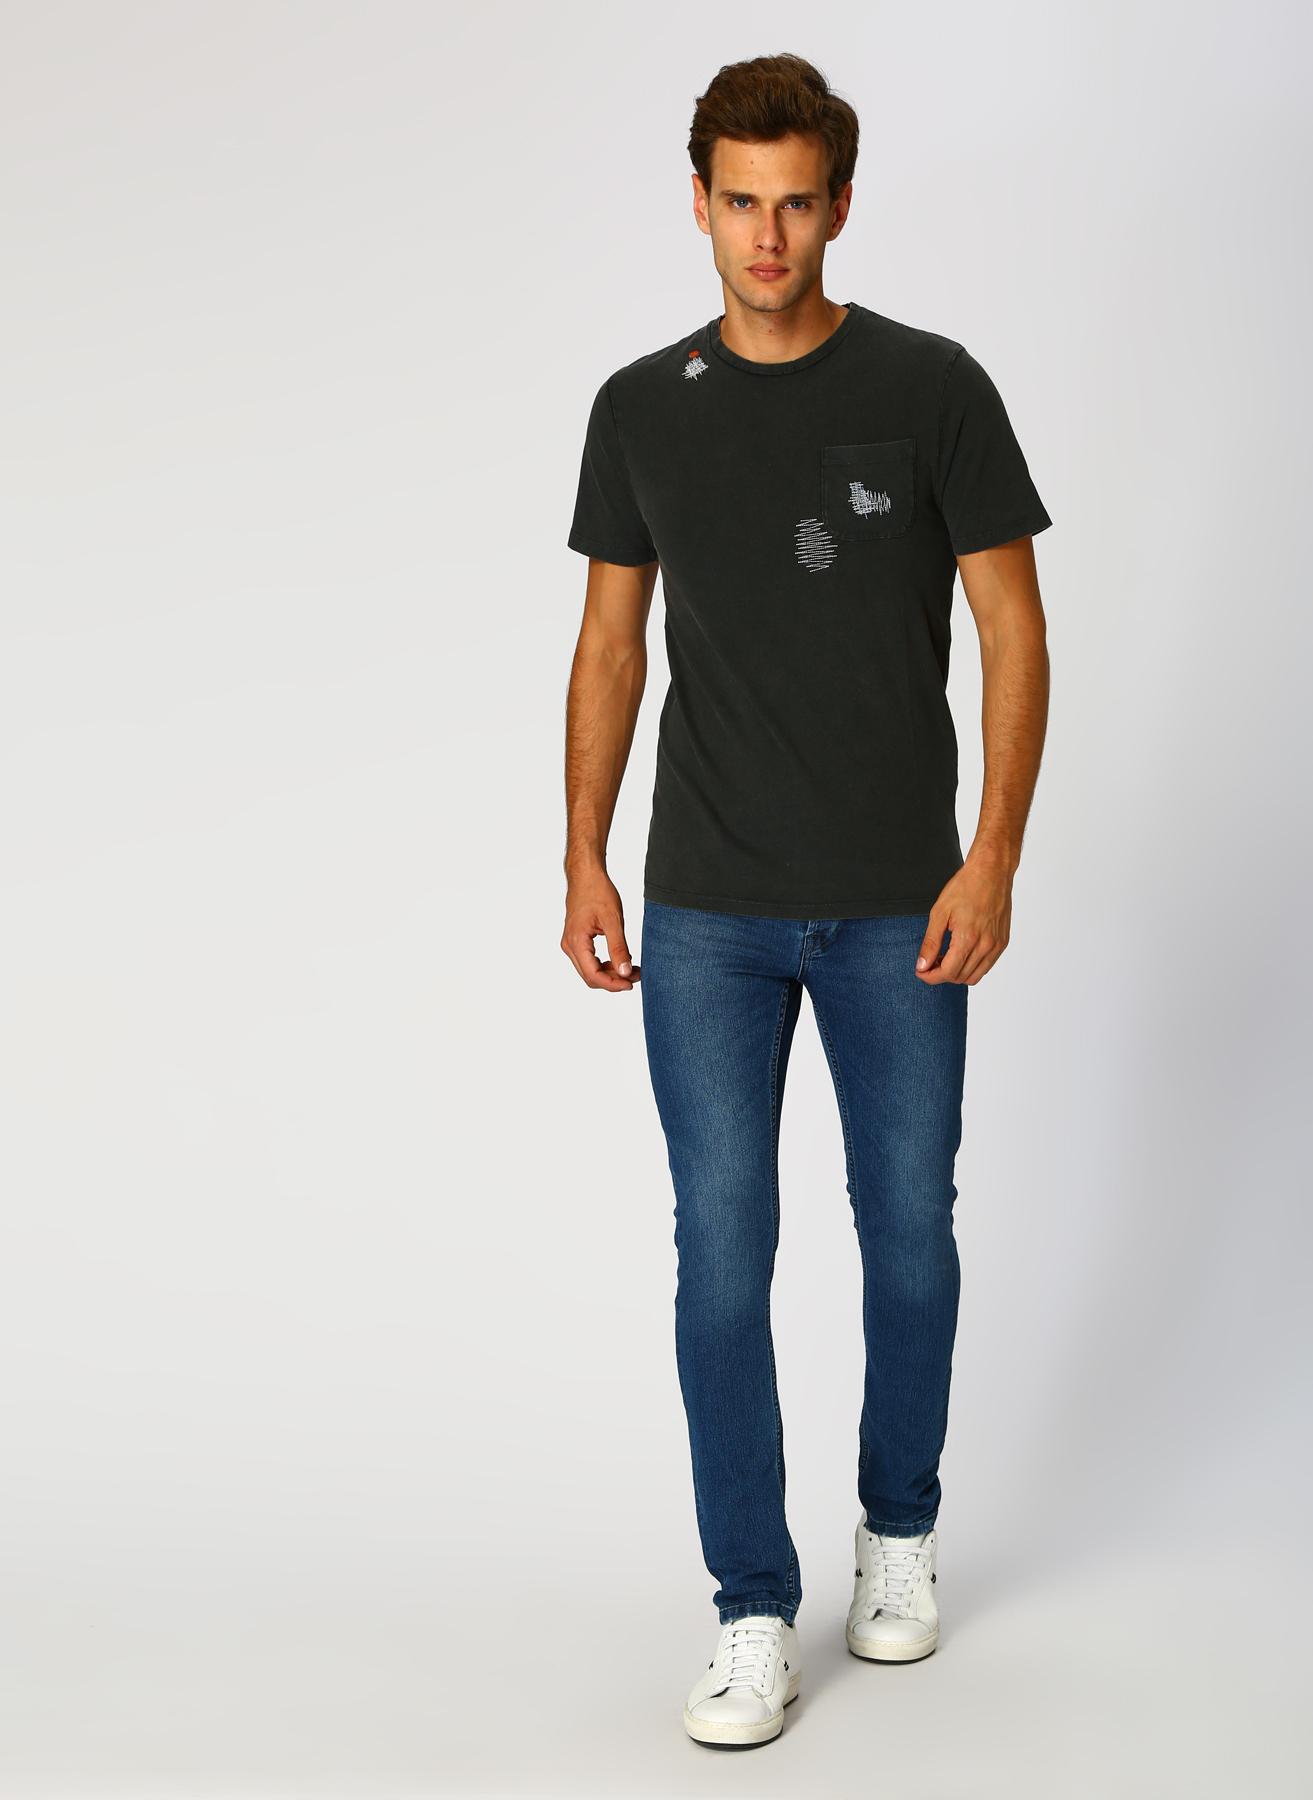 Only & Sons Lacivert Denim Pantolon 28-30 5002303472001 Ürün Resmi